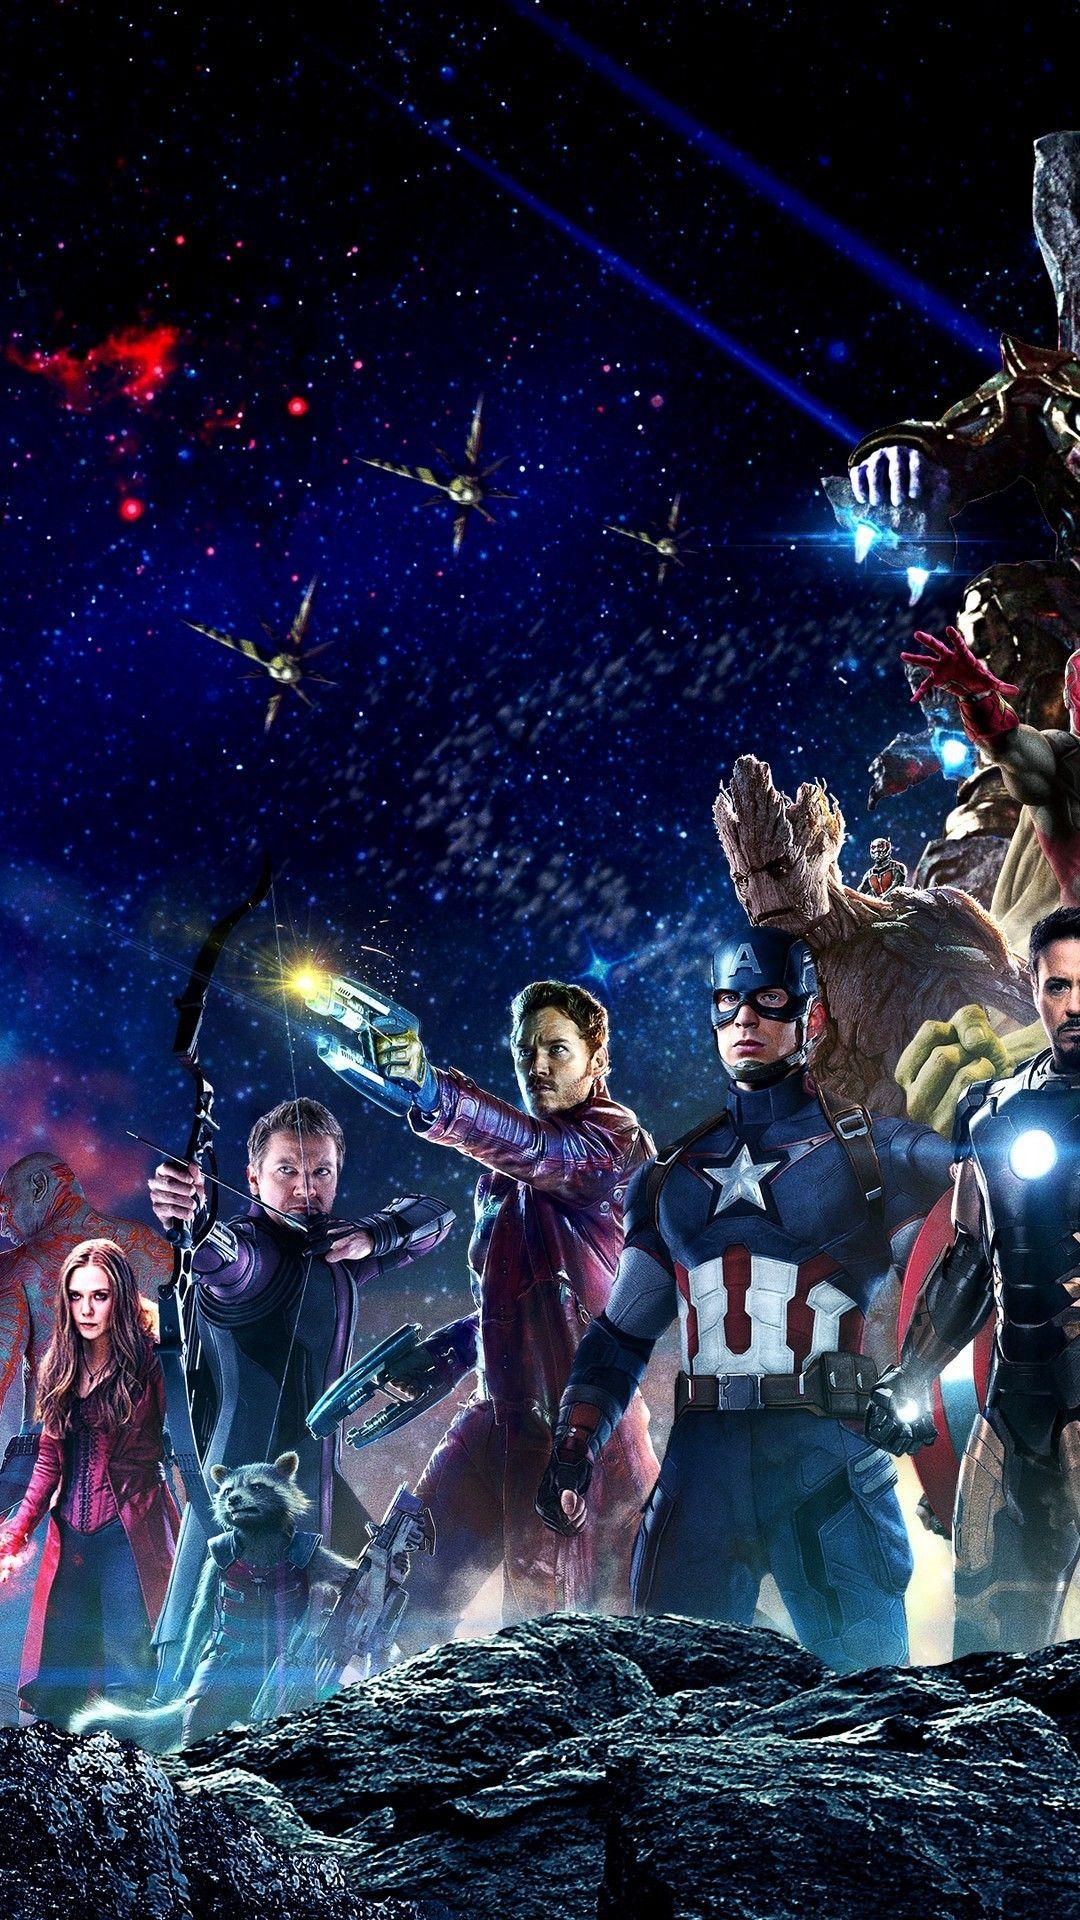 Unduh 600+ Wallpaper Avengers Hd Android HD